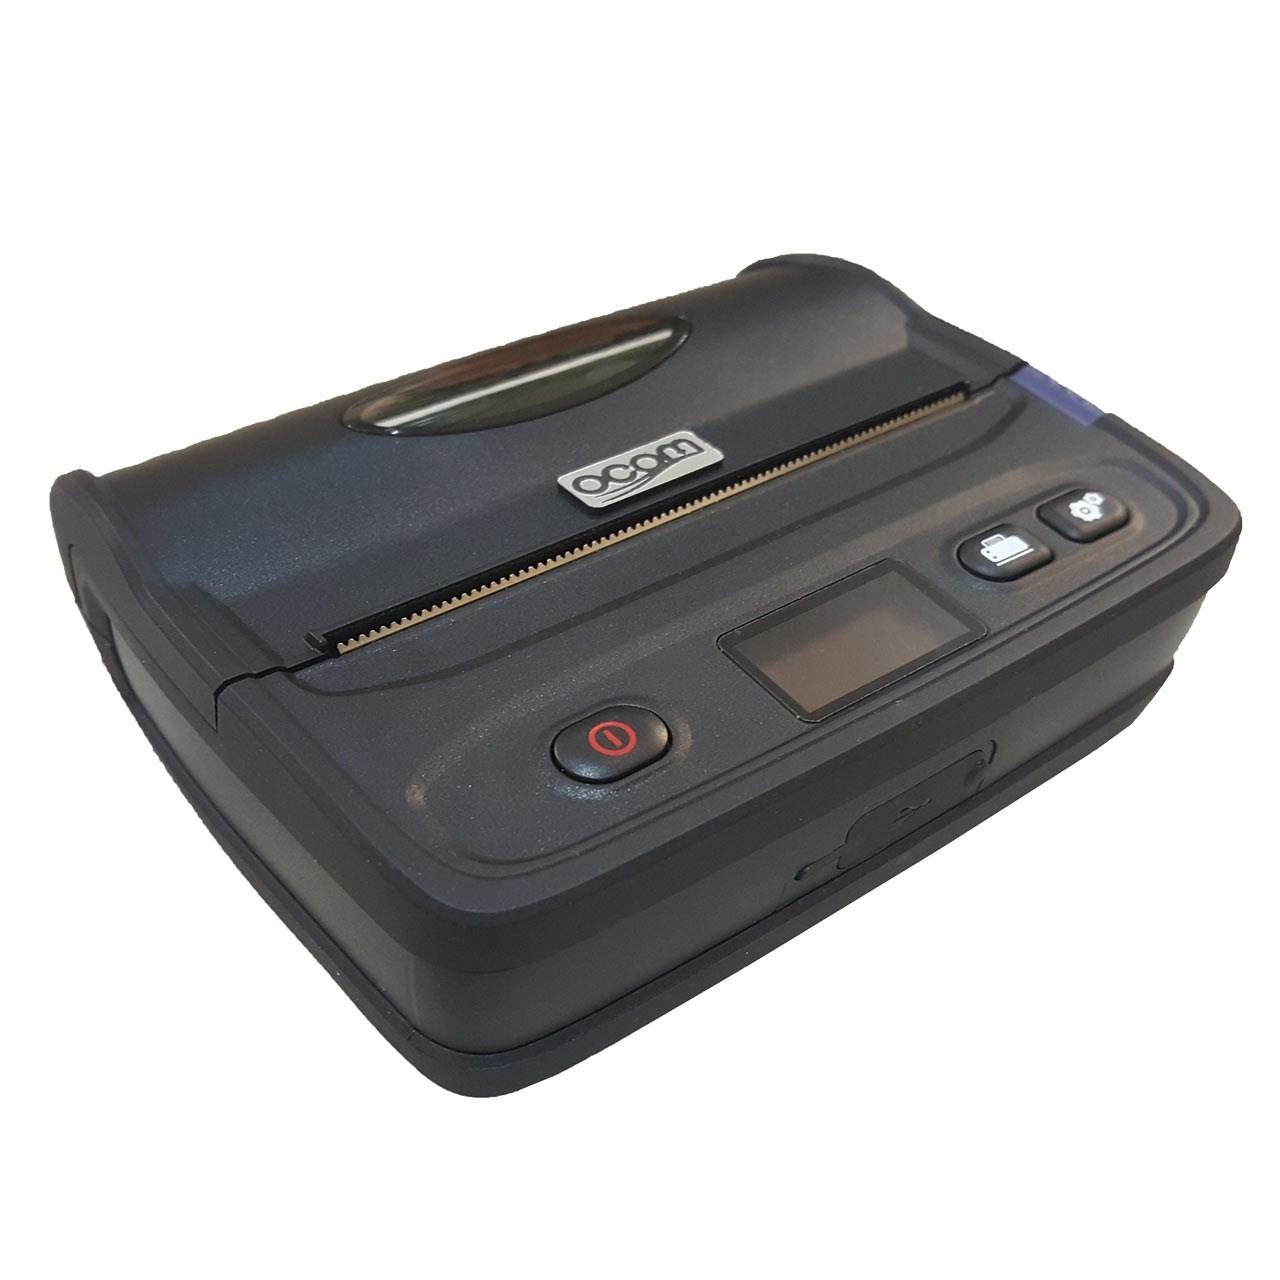 قیمت                      پرینتر حرارتی و لیبل حرارتی بلوتوث اوکوم مدل OCPP-M1001